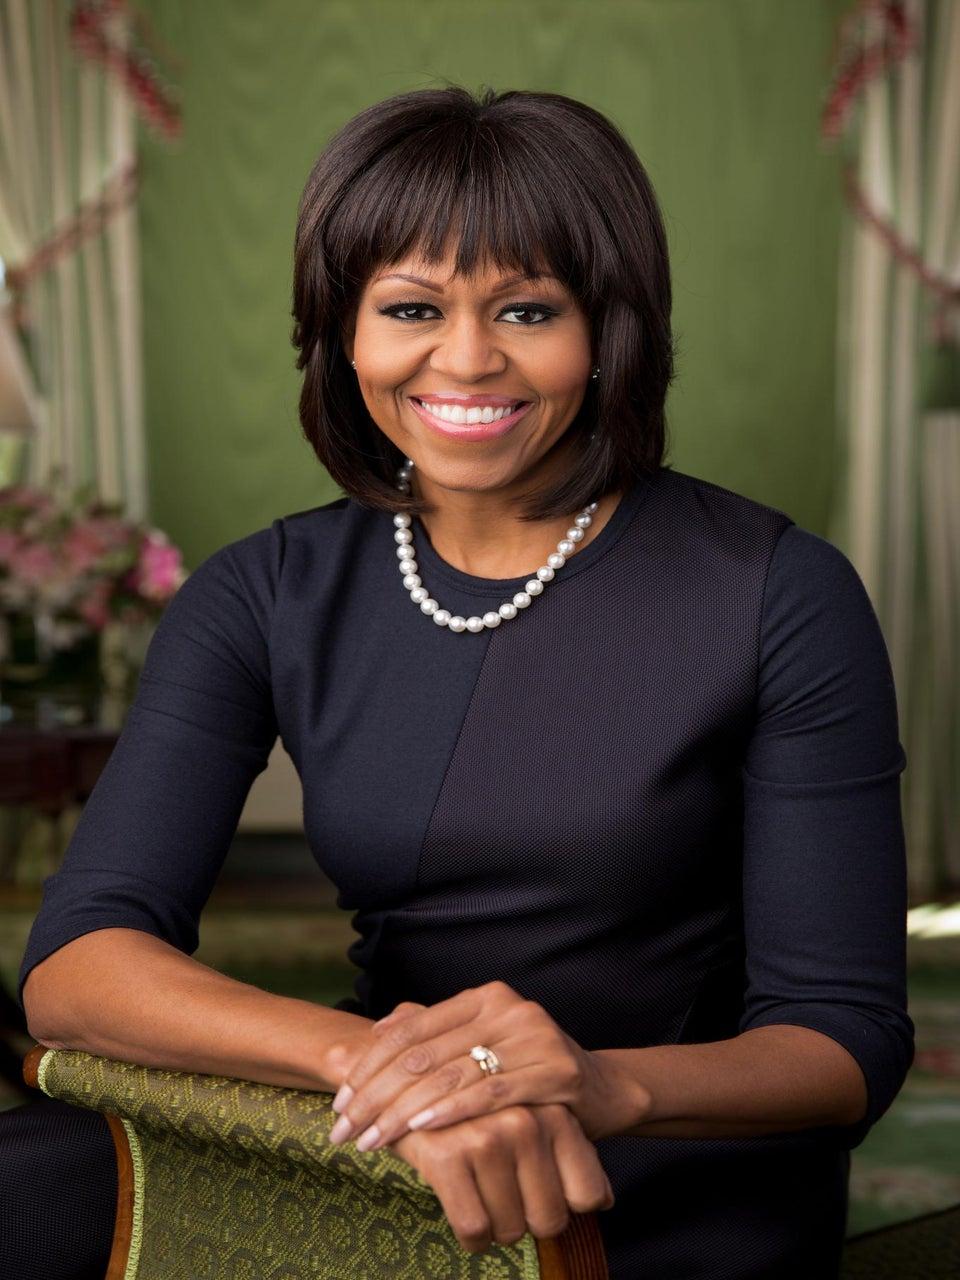 Michelle Obama Debuts Second Term Portrait